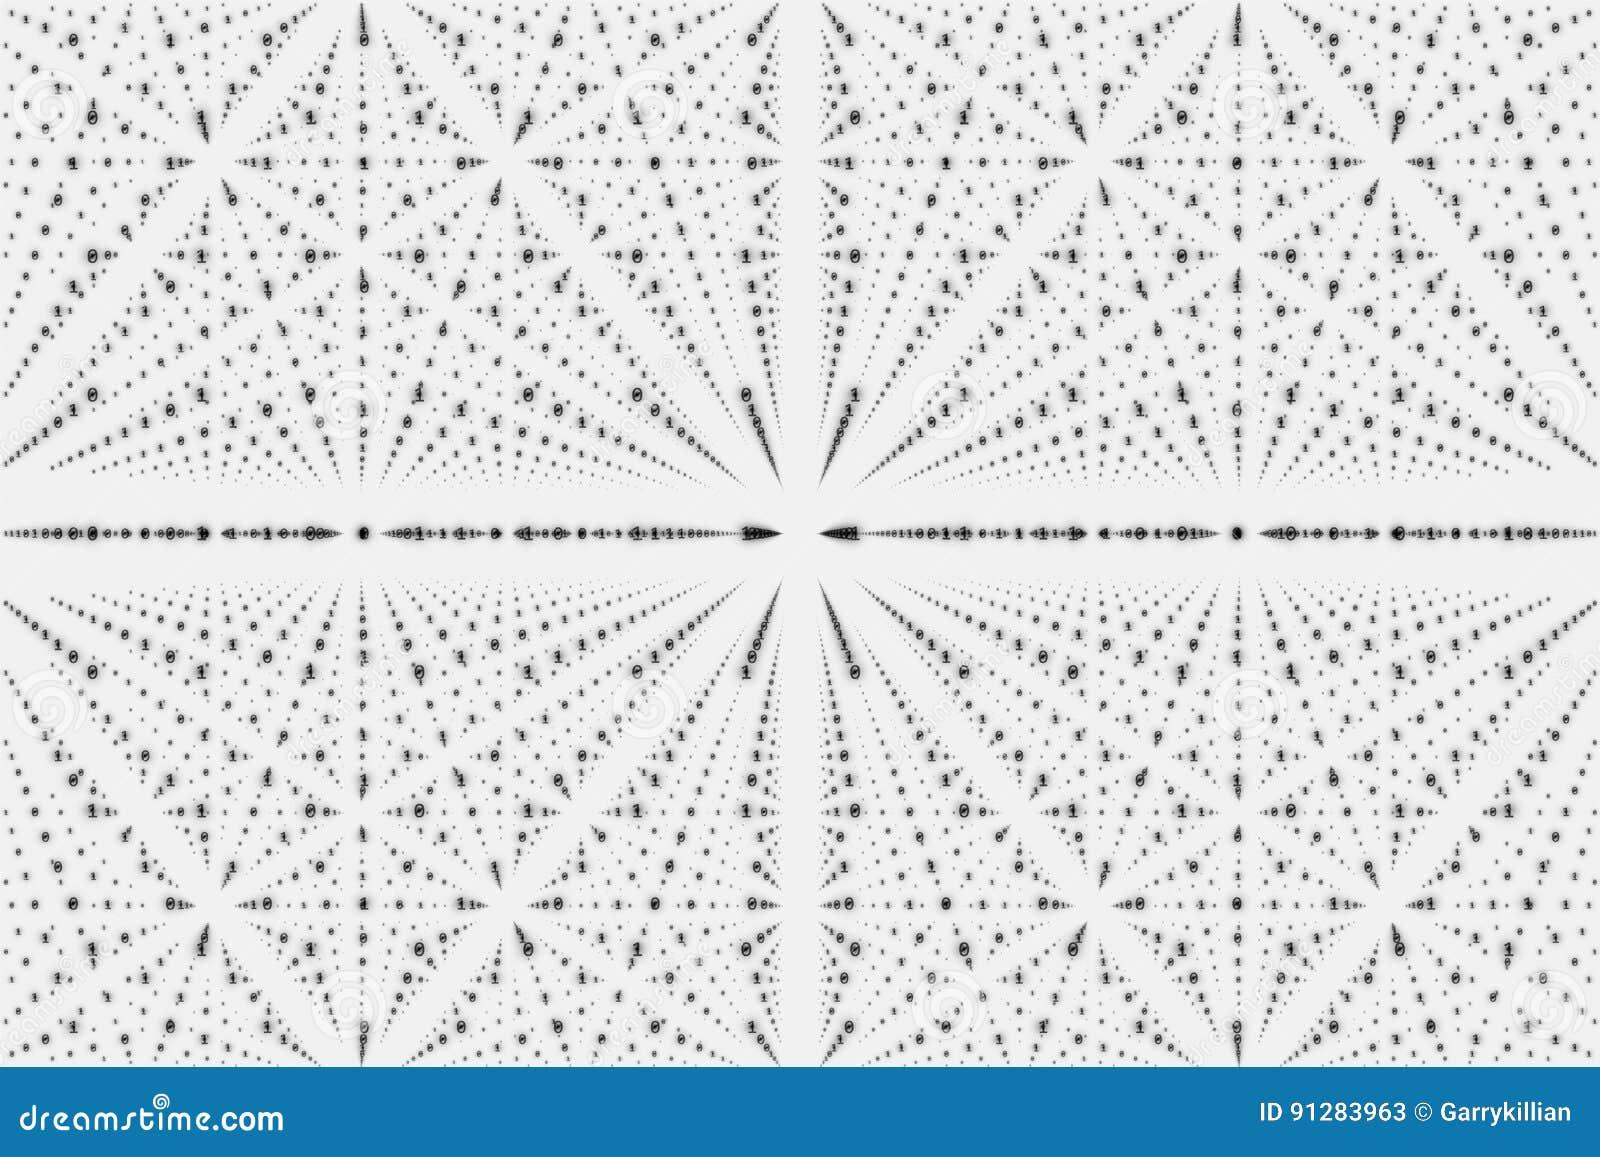 vector infinity data matrix visualization  grayscale big